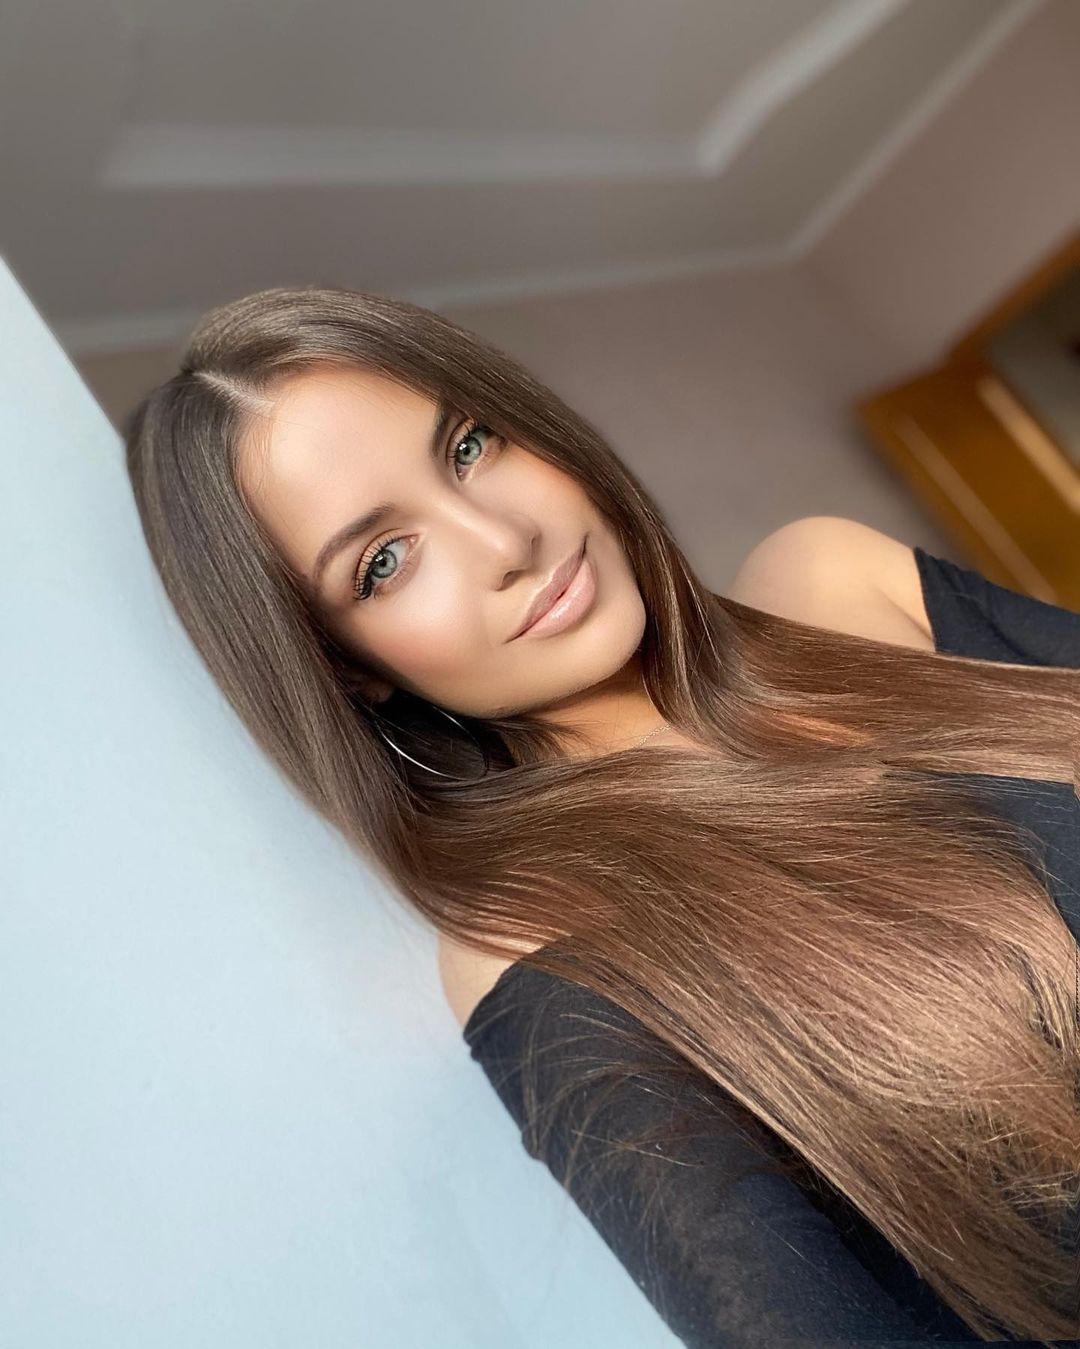 Alena-Gogoleva-Wallpapers-Insta-Biography-7